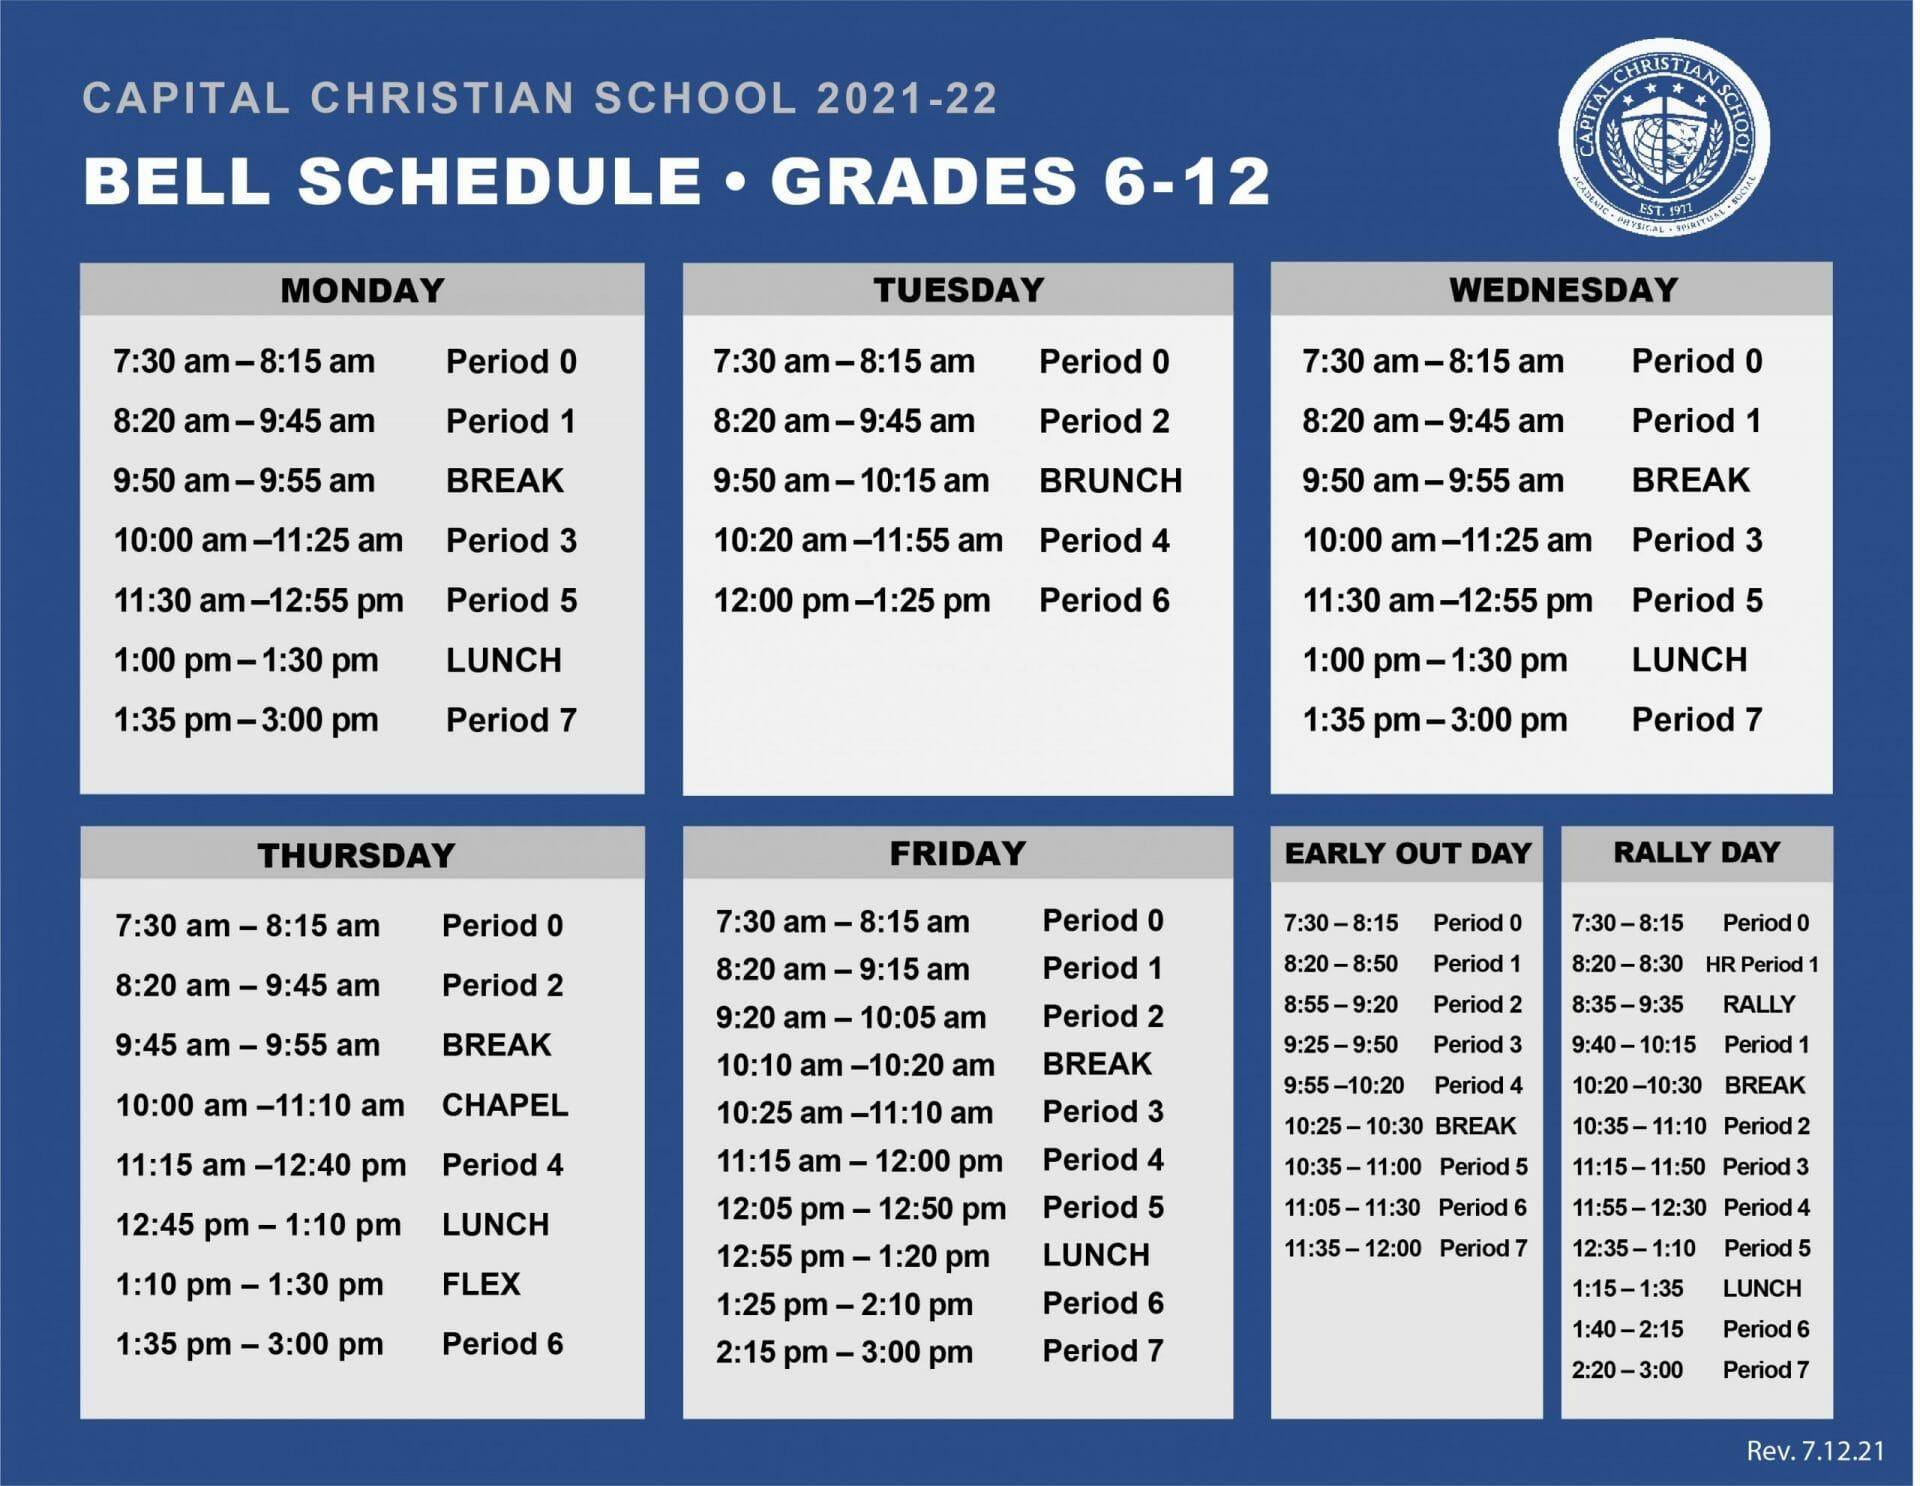 Bell Schedule 2021-22